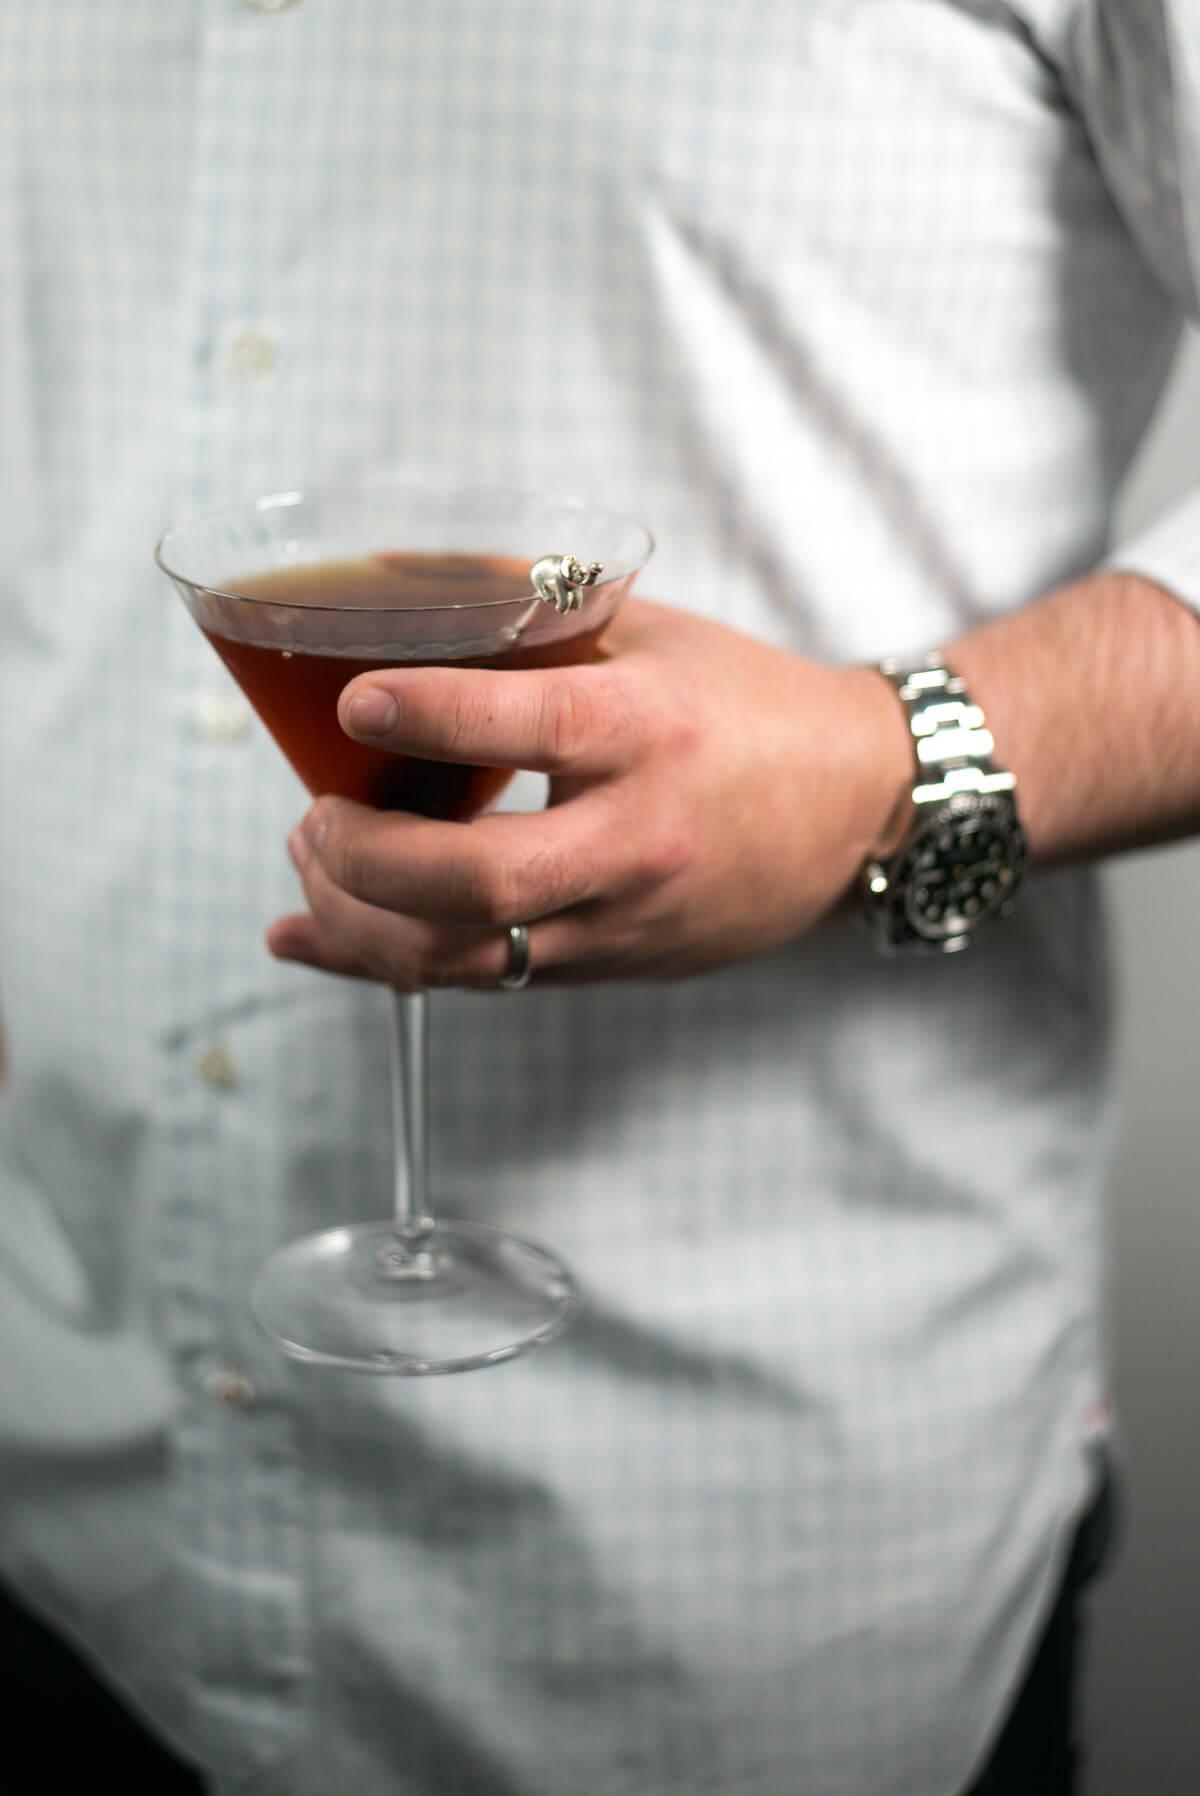 Classic manhattan cocktail served in William Yeoward American Bar martini glasses